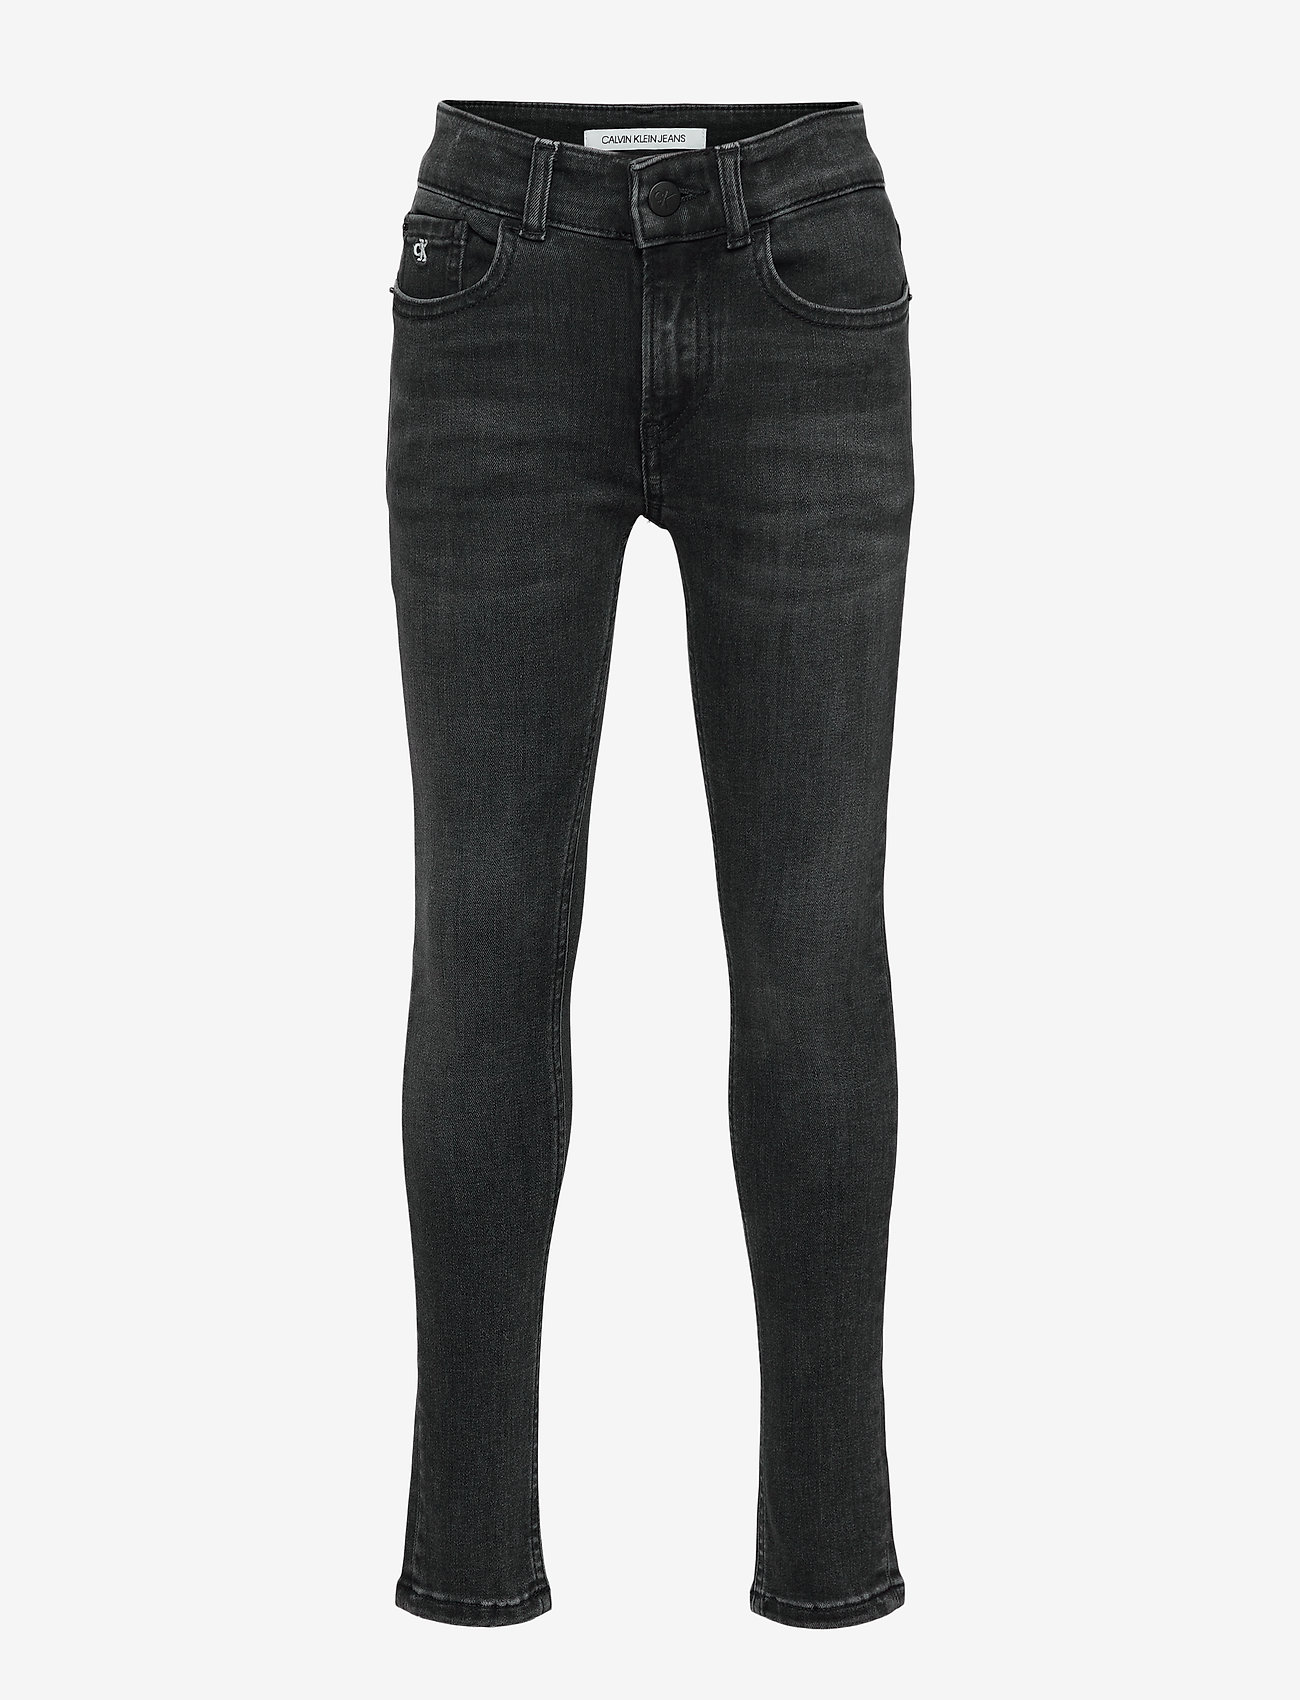 Calvin Klein - SUPER SKINNY MONOGRAM BLK STR - jeans - monogram black stretch - 0